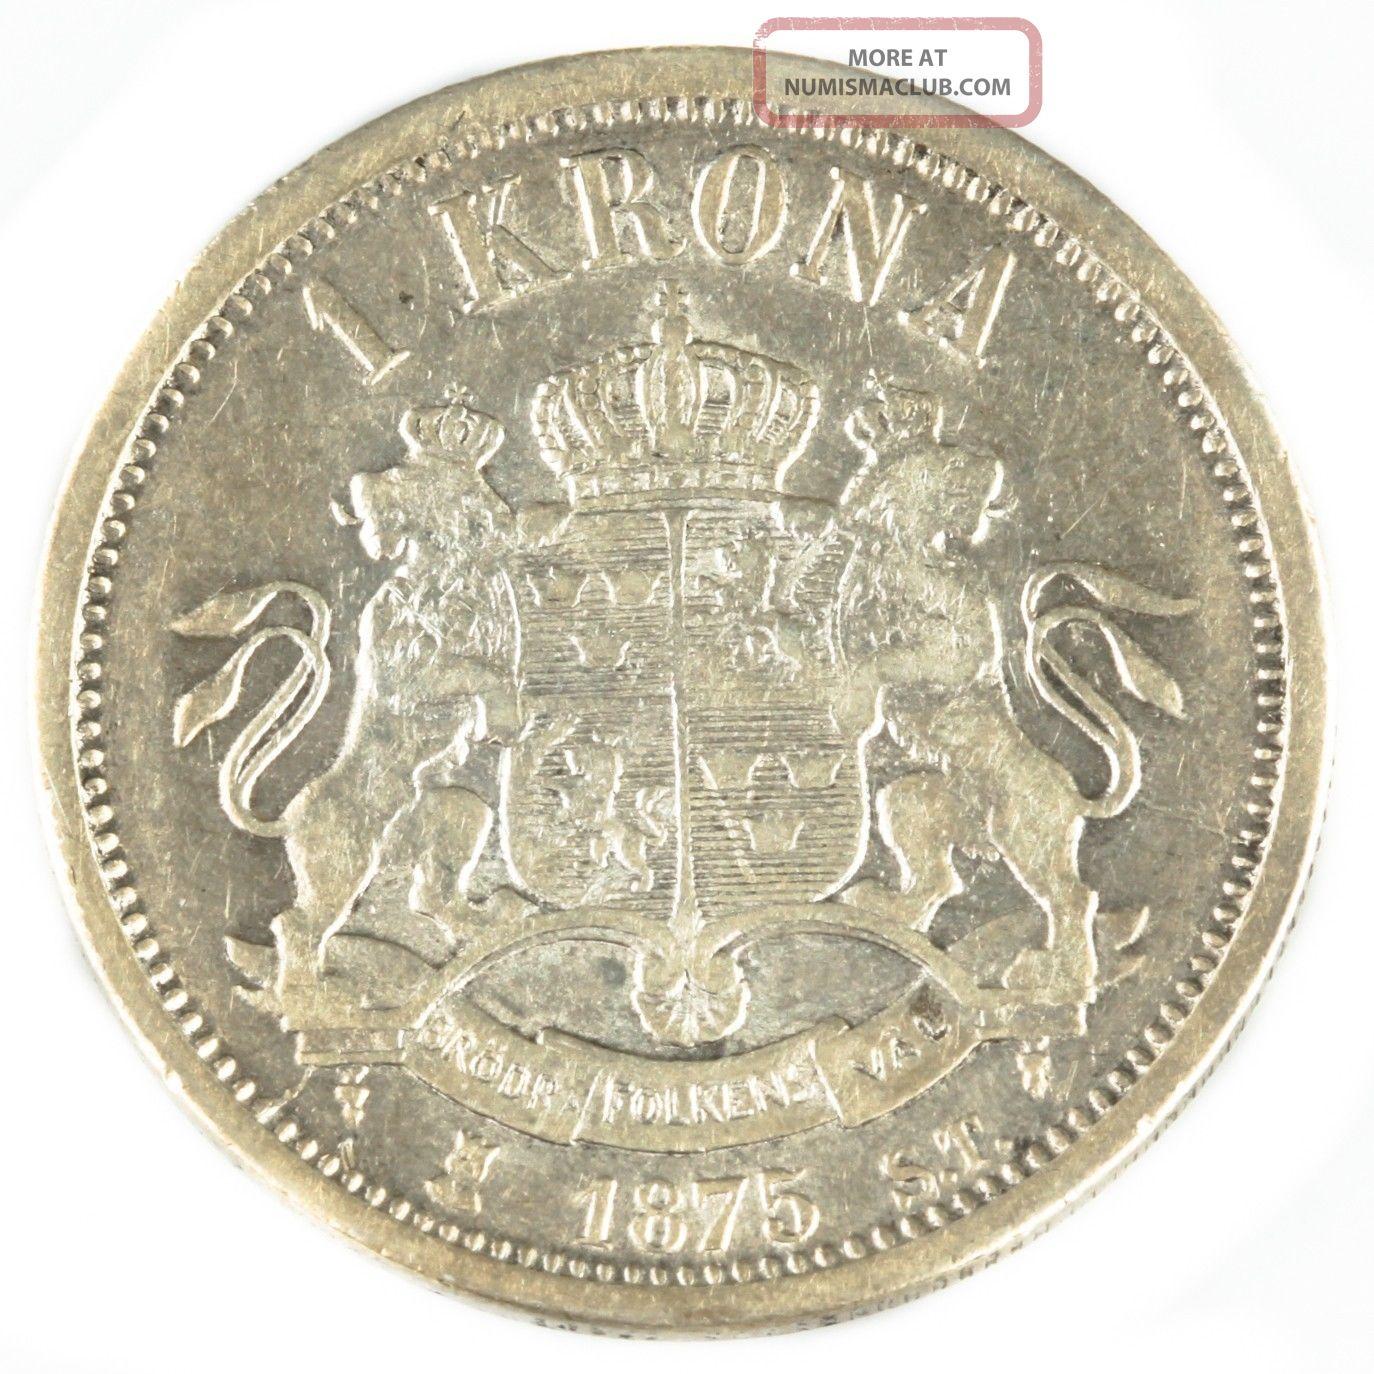 1875 St Sweden 1 Krona Vf Silver Coin Rare Foreign Swedish ...